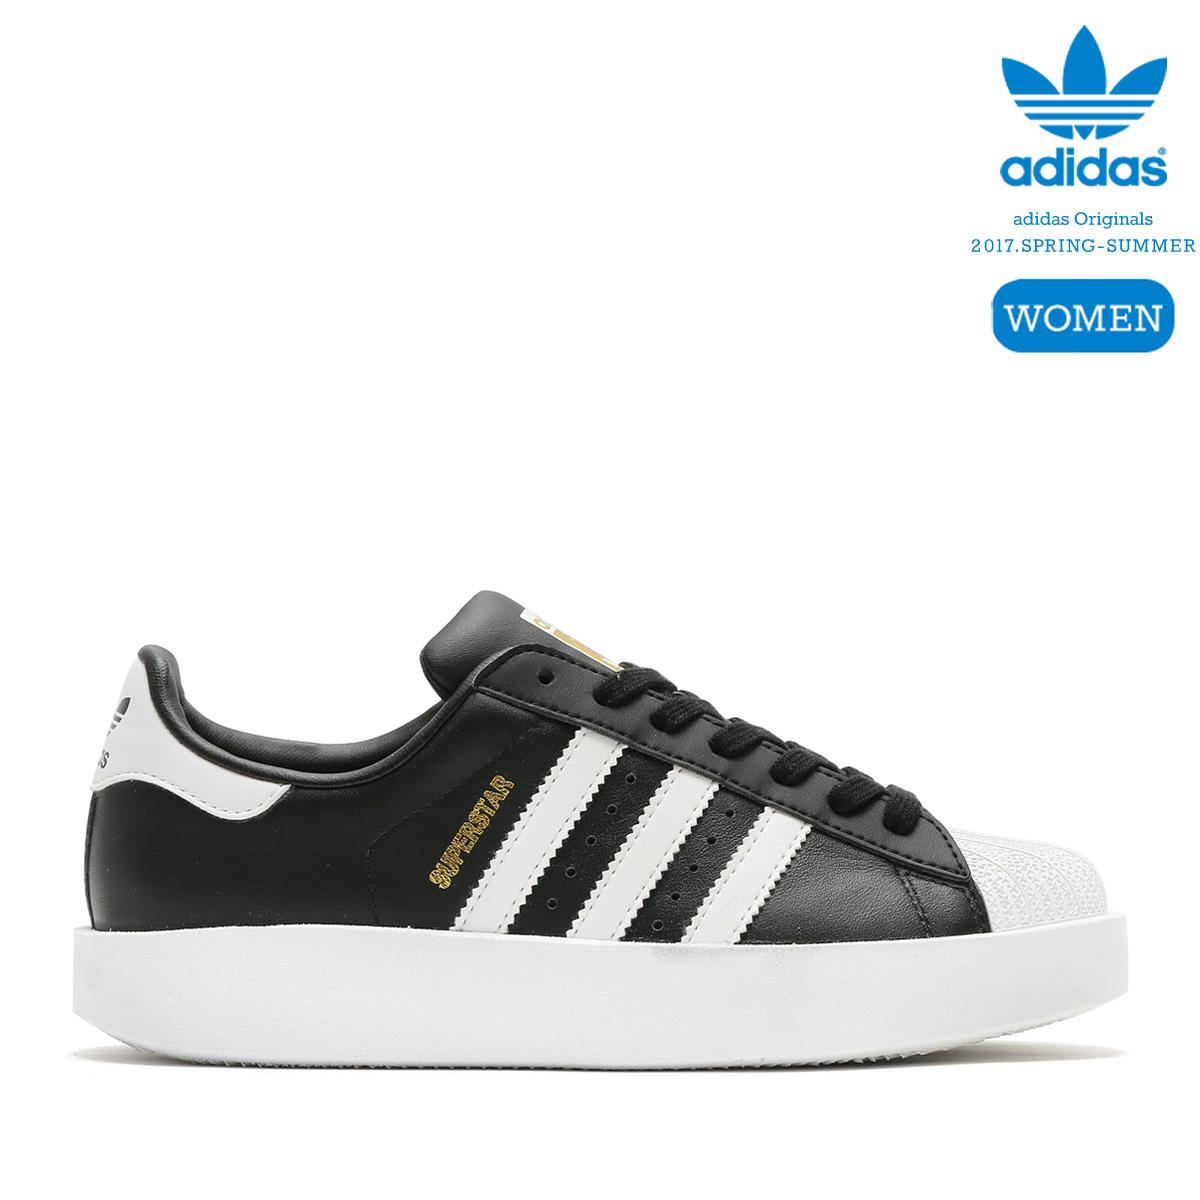 cheaper 23fdc be5f2 adidas Originals SUPERSTAR BD W (Core Black Running White Gold Mett) (Adidas  originals superstar boldface)